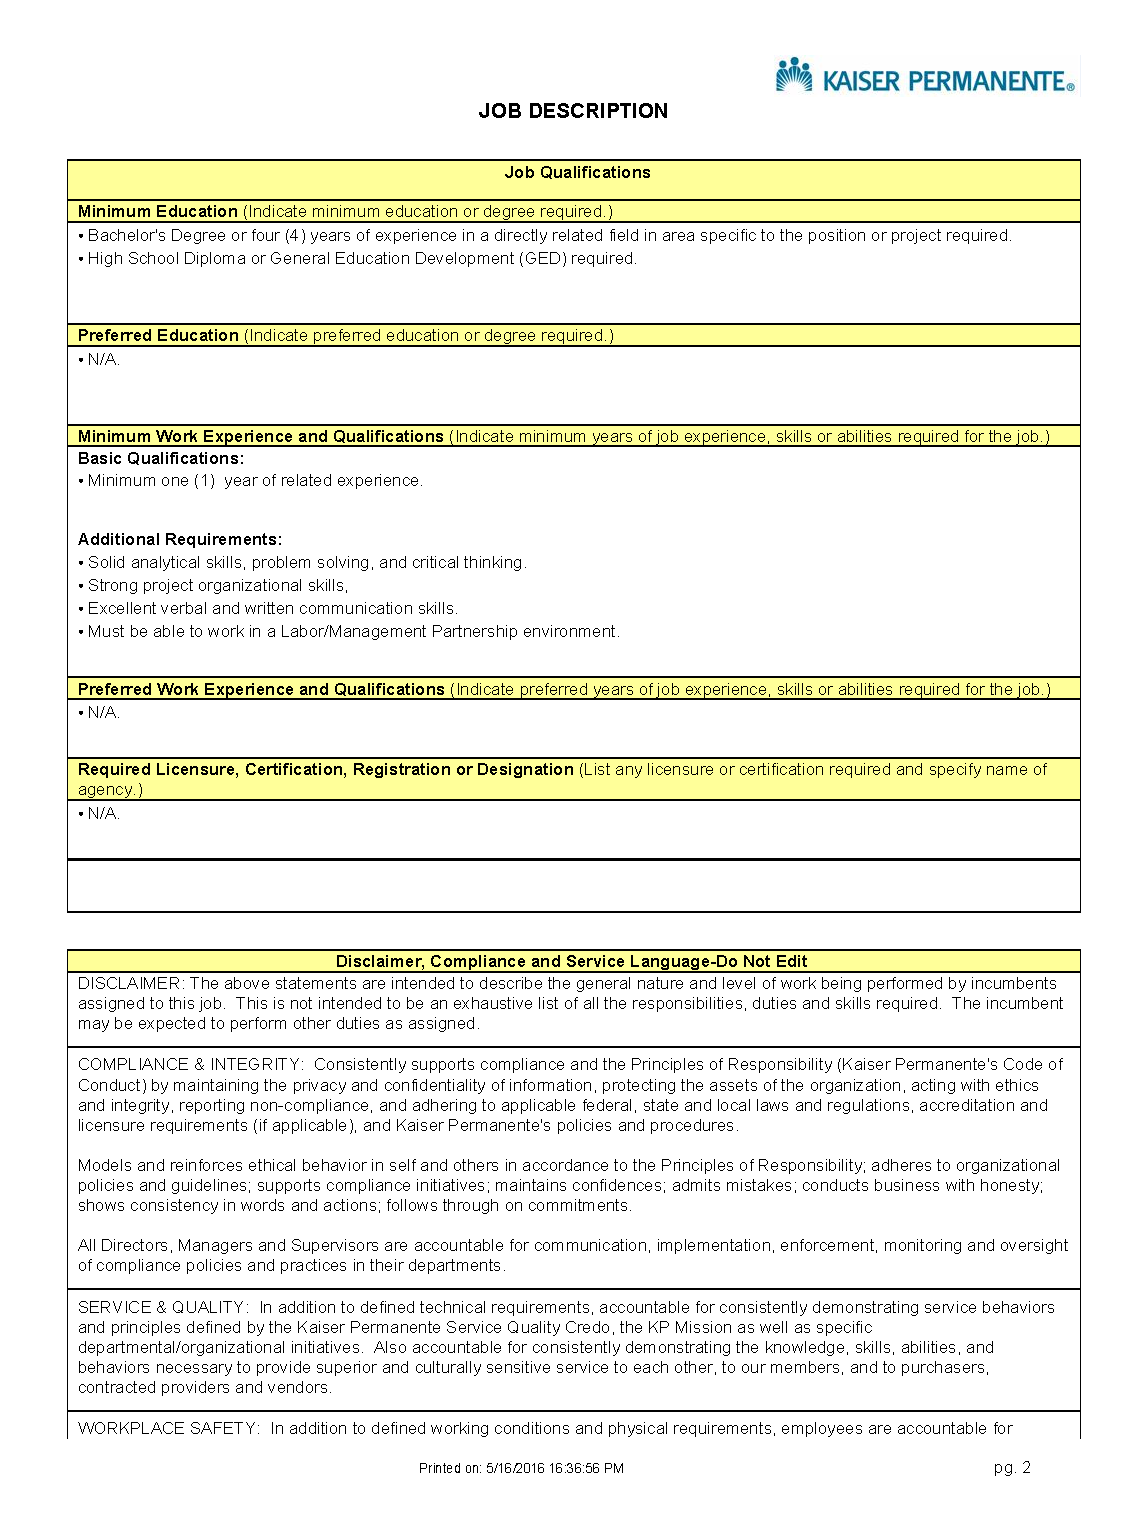 online disclaimer statements